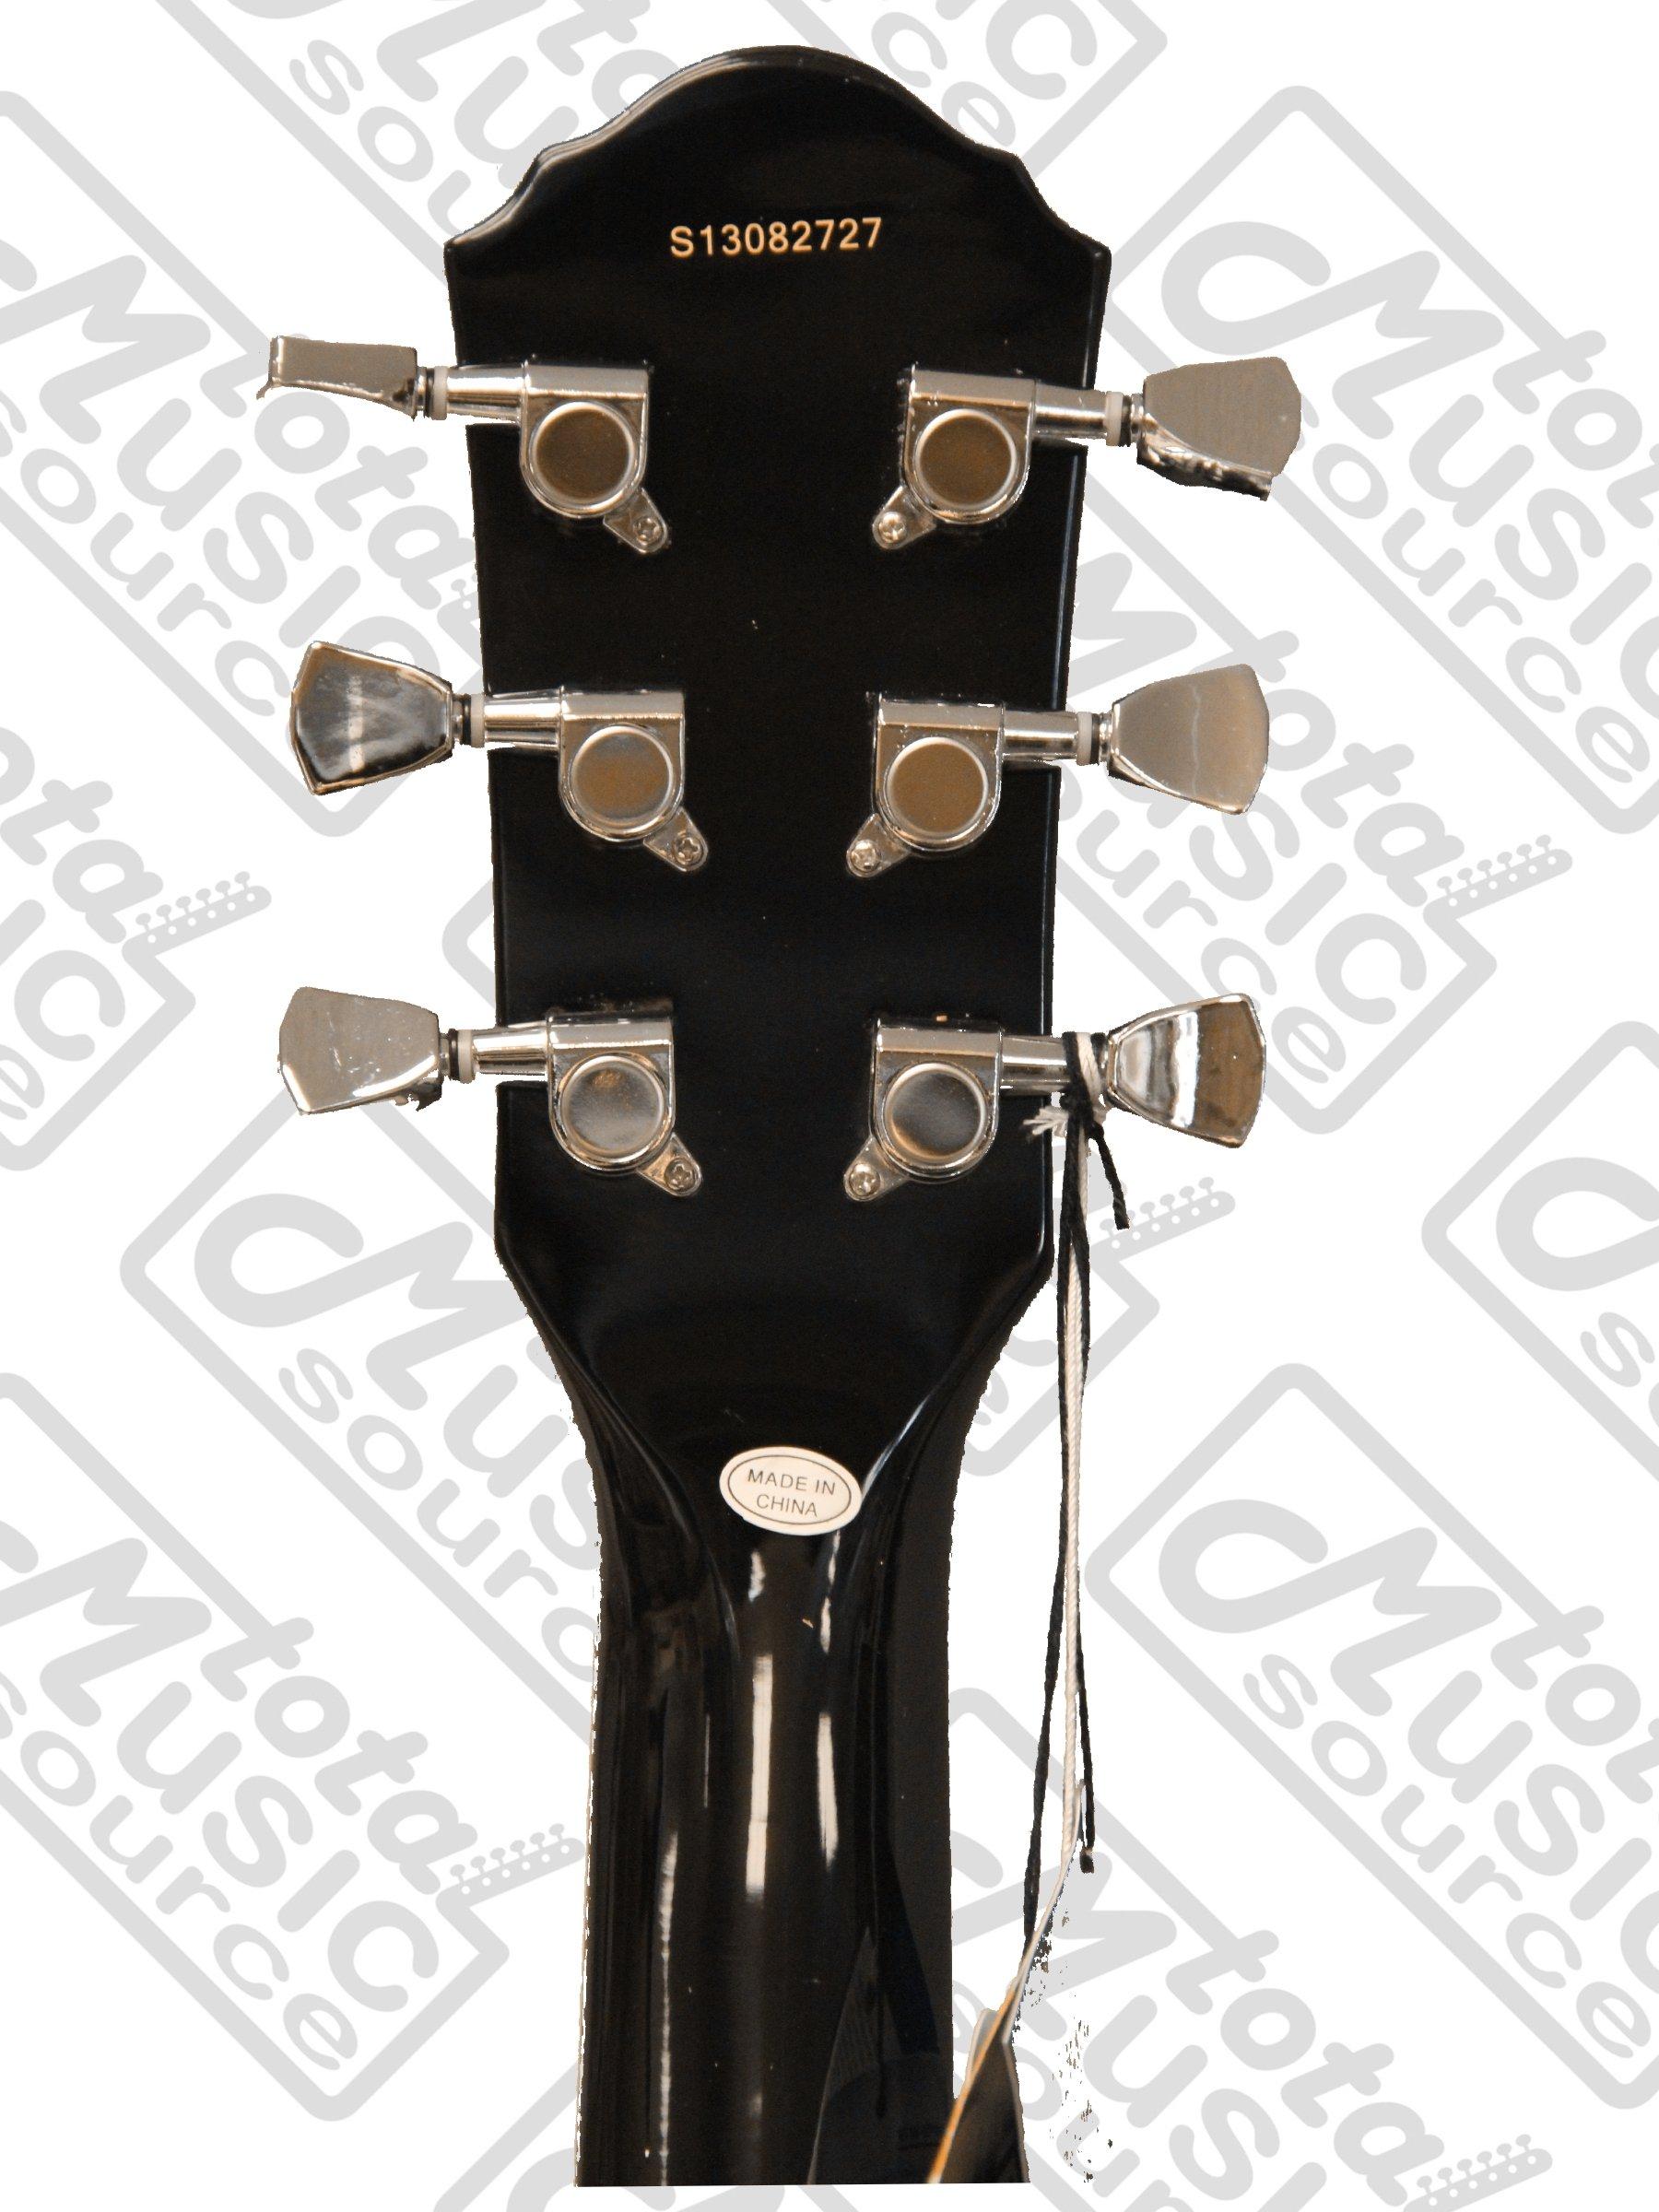 Oscar Schmidt Delta King Electric Guitar, Black, OE30B CP STRAP PICKS GIGBAG by Oscar Schmidt (Image #6)